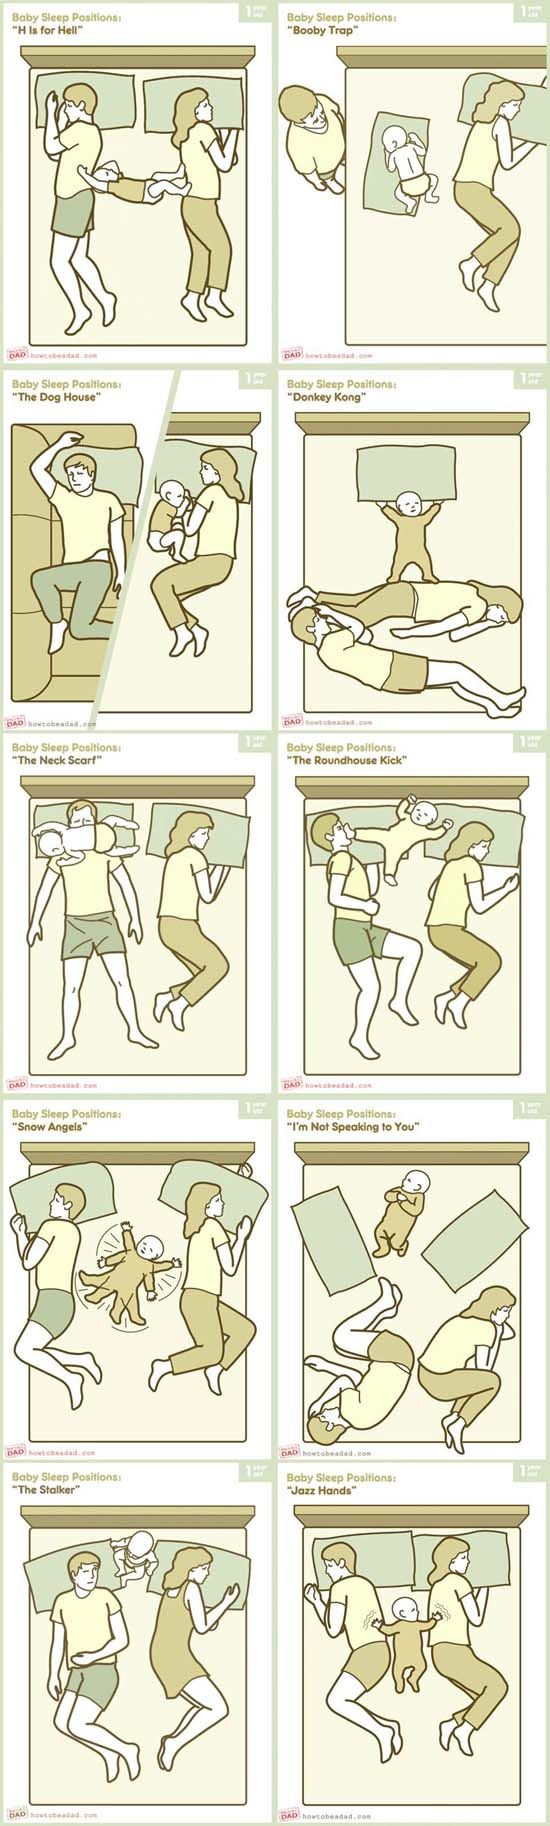 baby sleep positions.Sleep Positions Lol, Co Sleep Hells, Dogs House, Funny, Dog Houses, Baby Sleep, La Comodidad, Como Duerme, Comodidad De